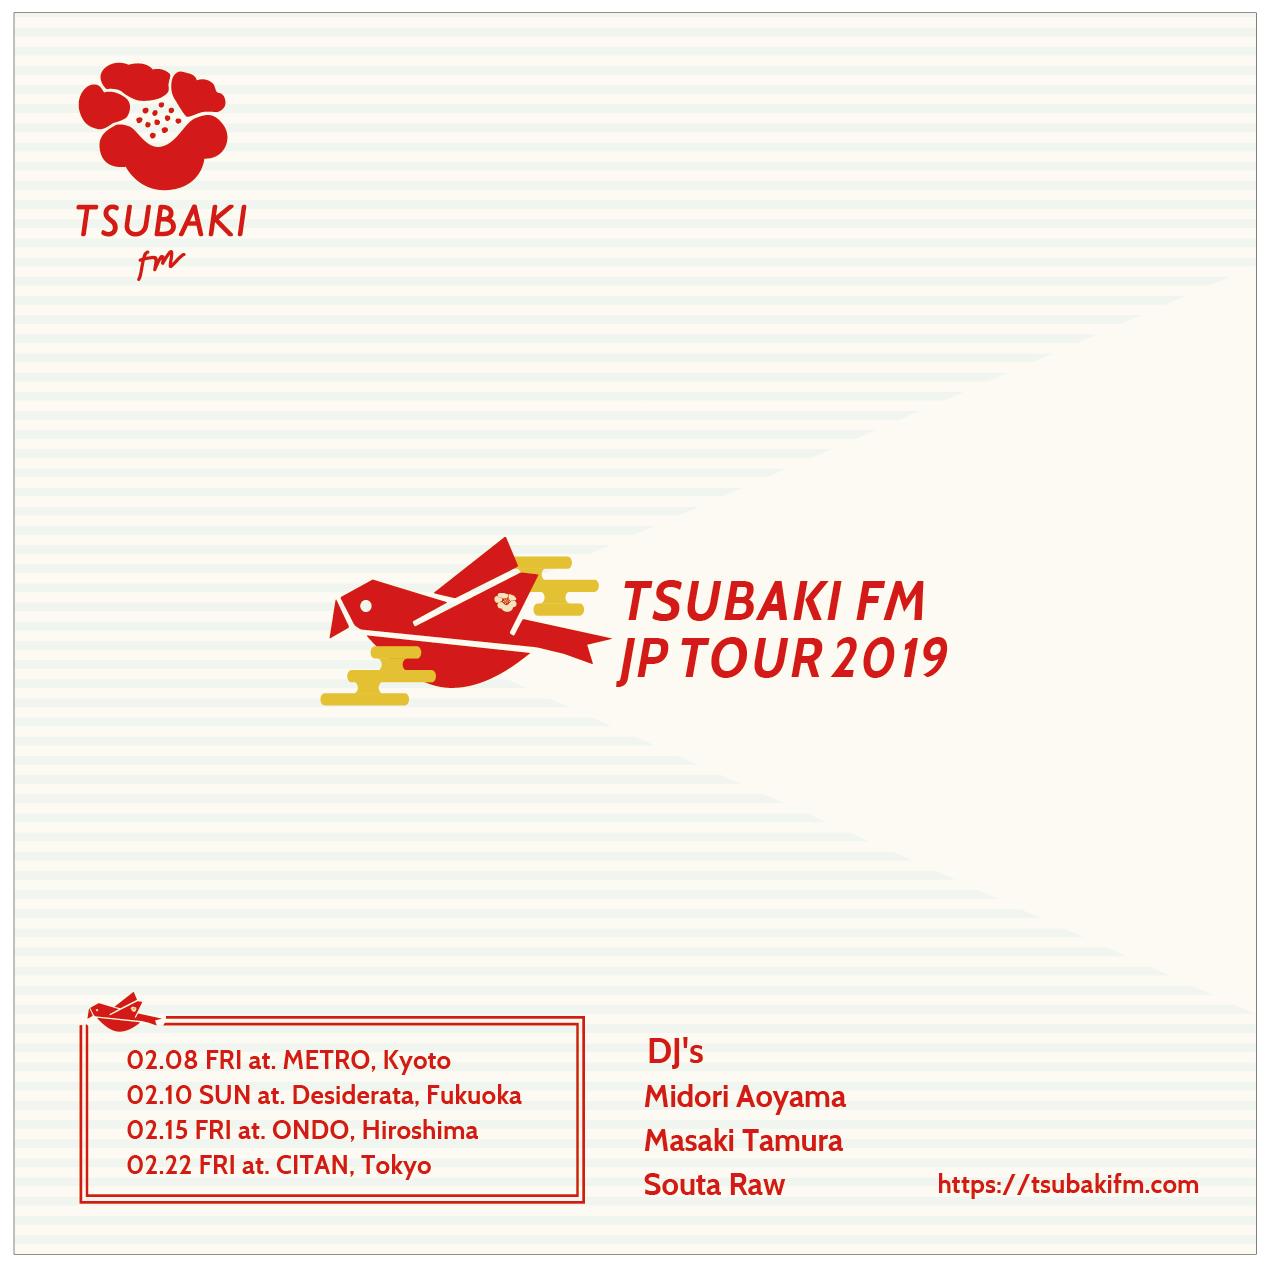 tsubaki fm japan tour 2019